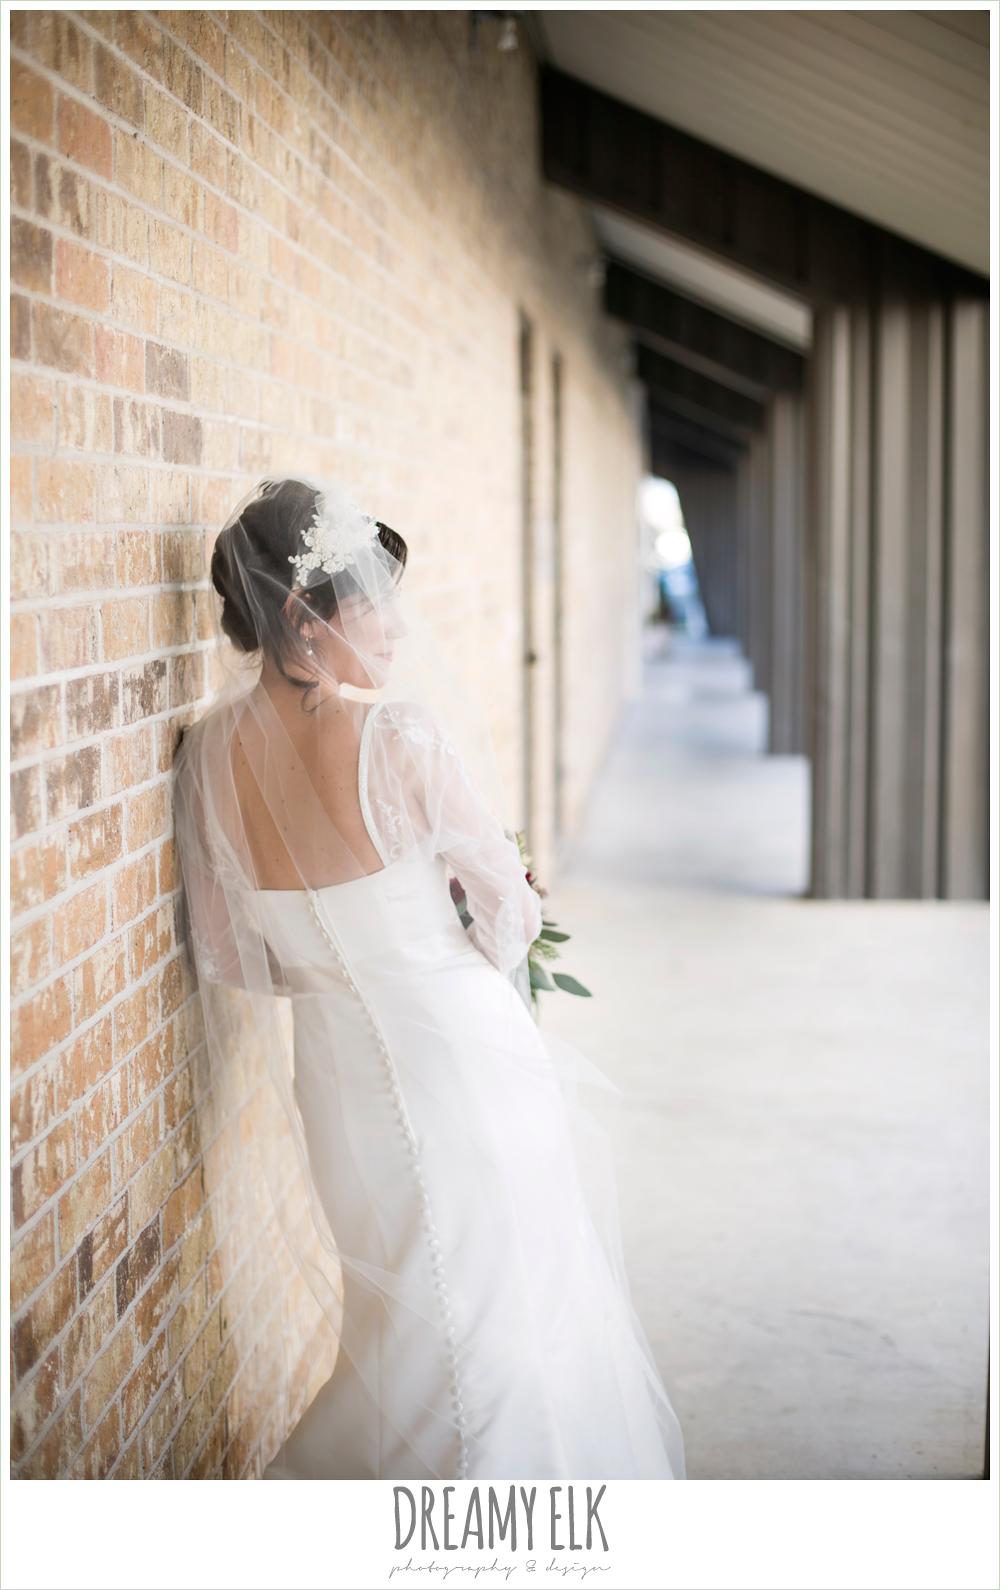 bride, long sleeve wedding dress, outdoor bridal photo, winter december church wedding photo {dreamy elk photography and design}